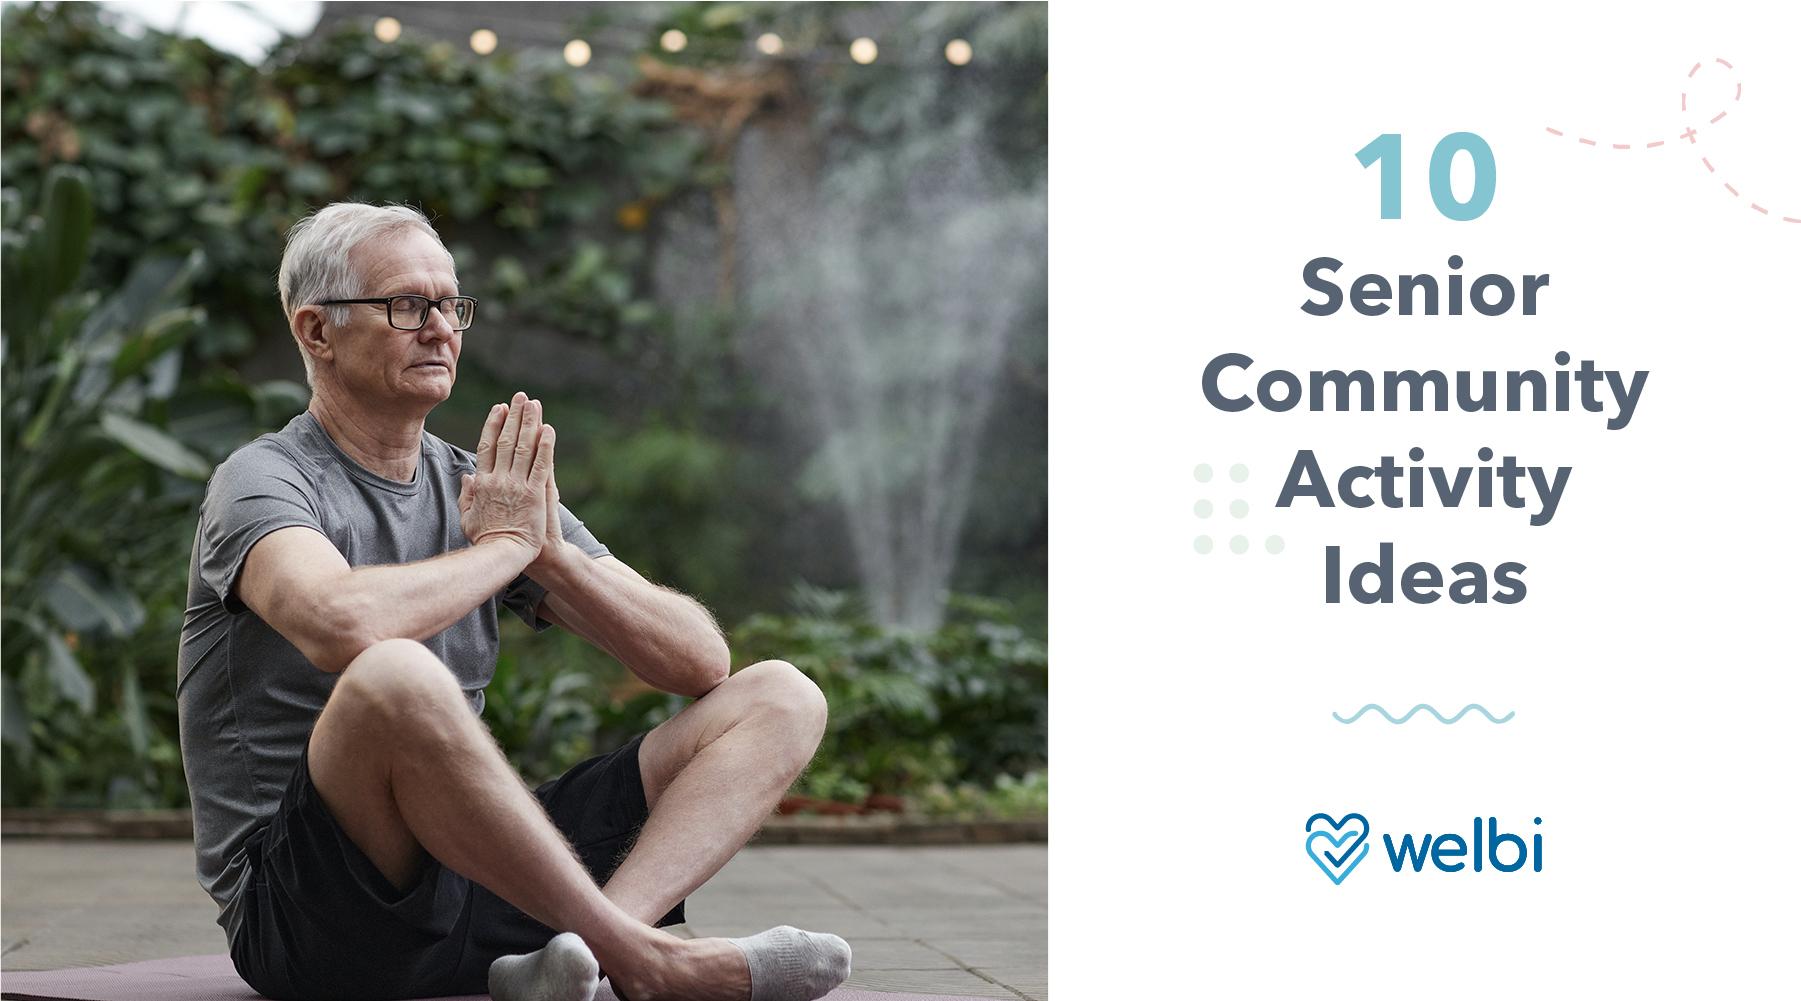 10 Senior Community Activity Ideas